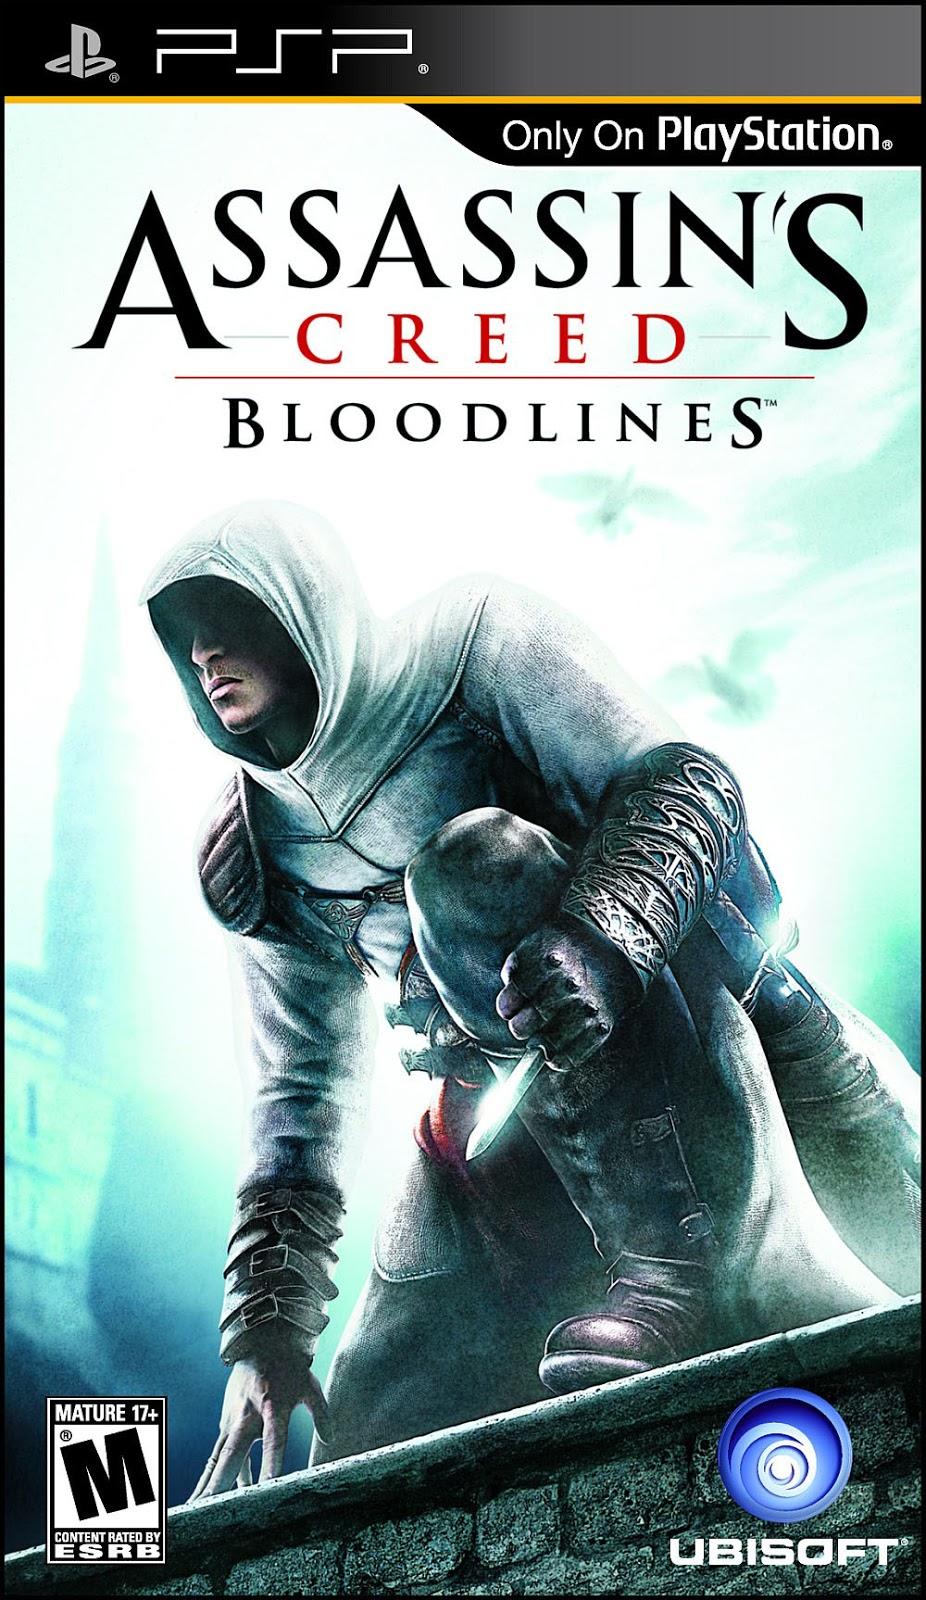 assassin's creed bloodlines ppsspp - 4ugames